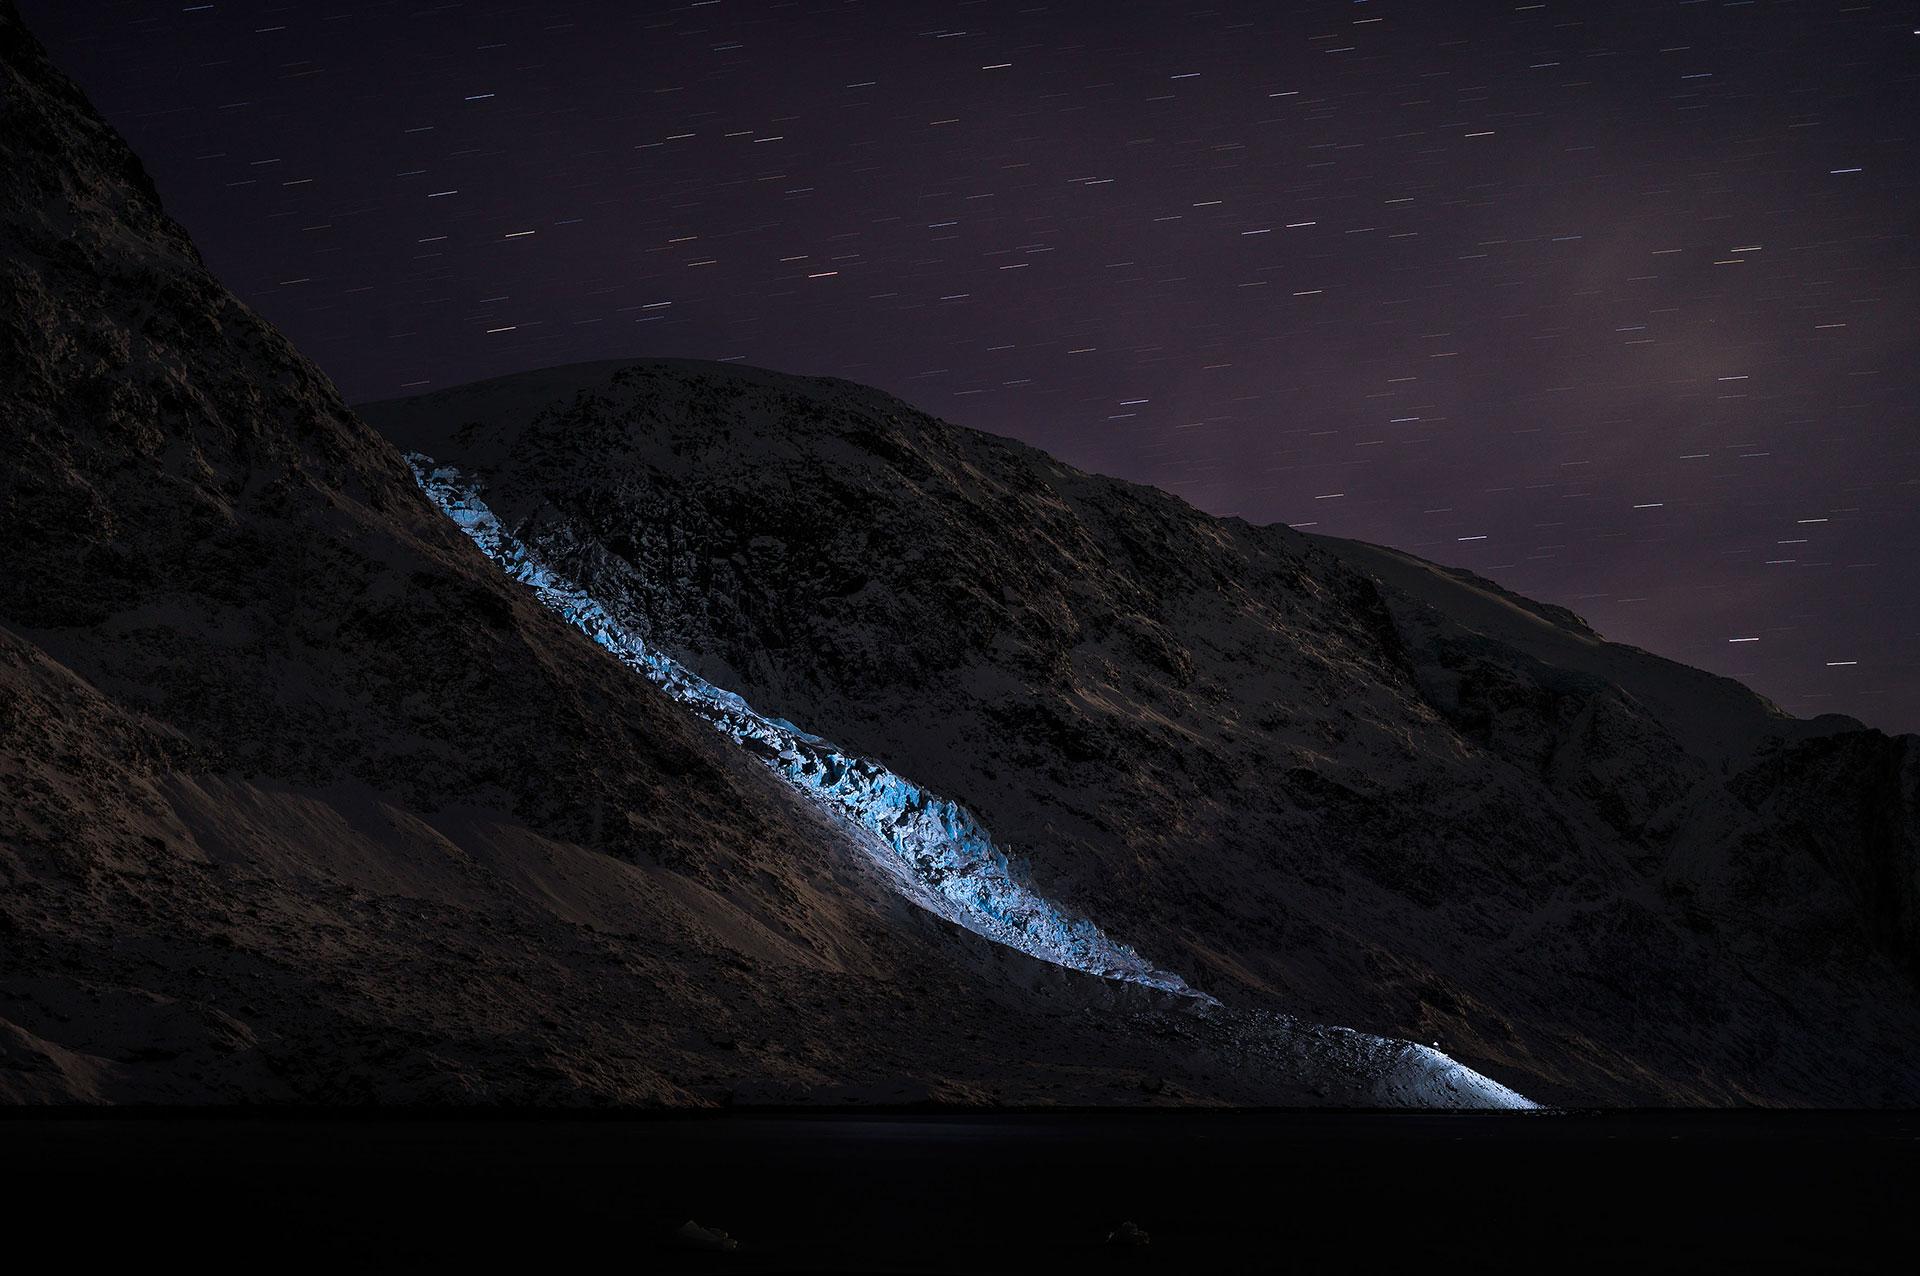 River of Ice - Sven Nieder